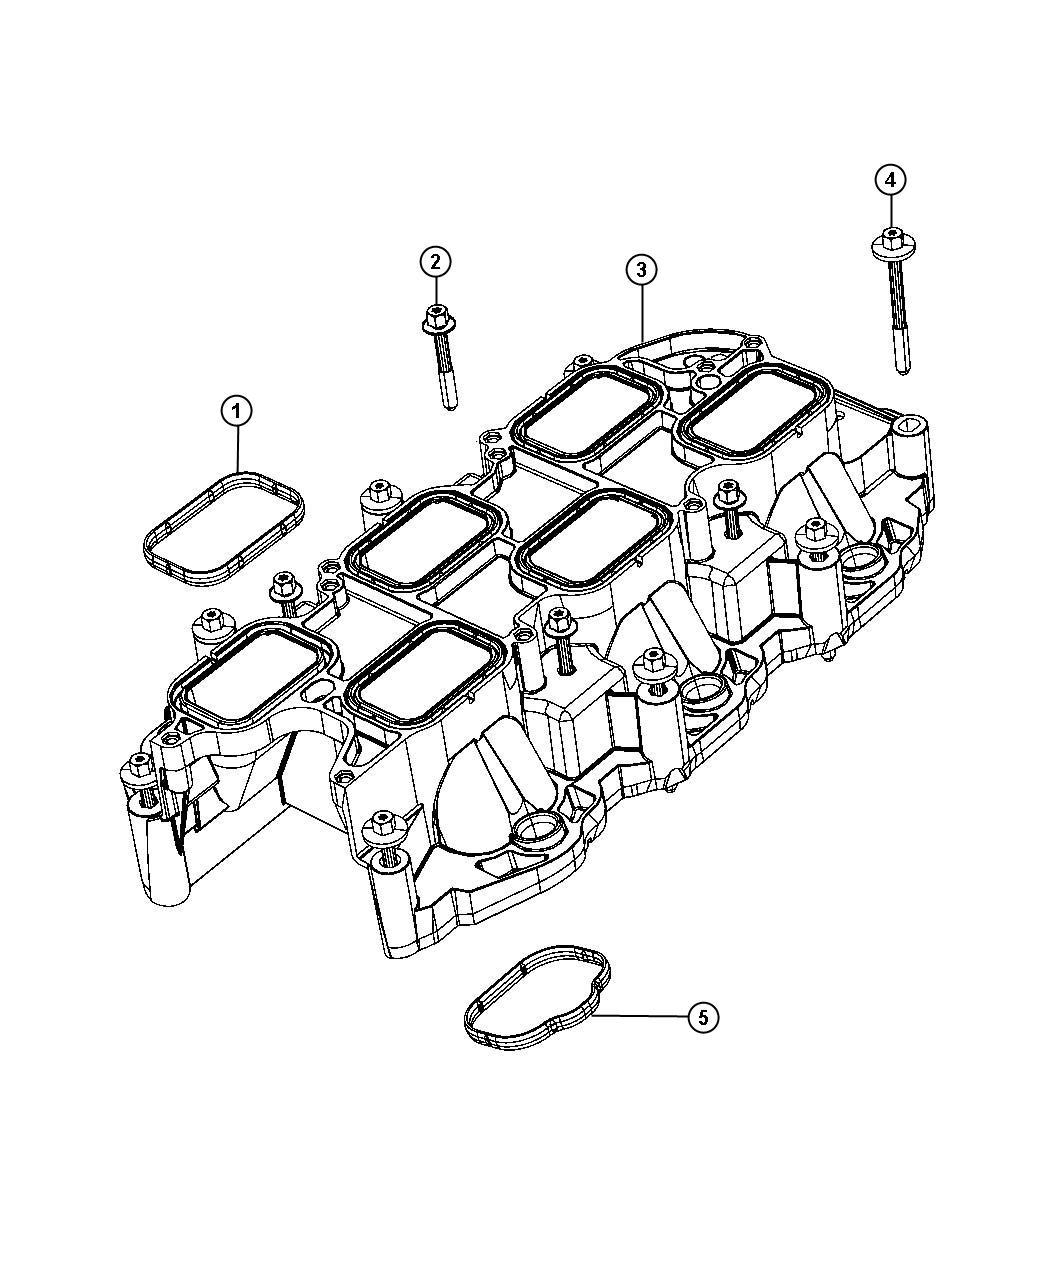 Jeep Wrangler Manifold Intake Lower